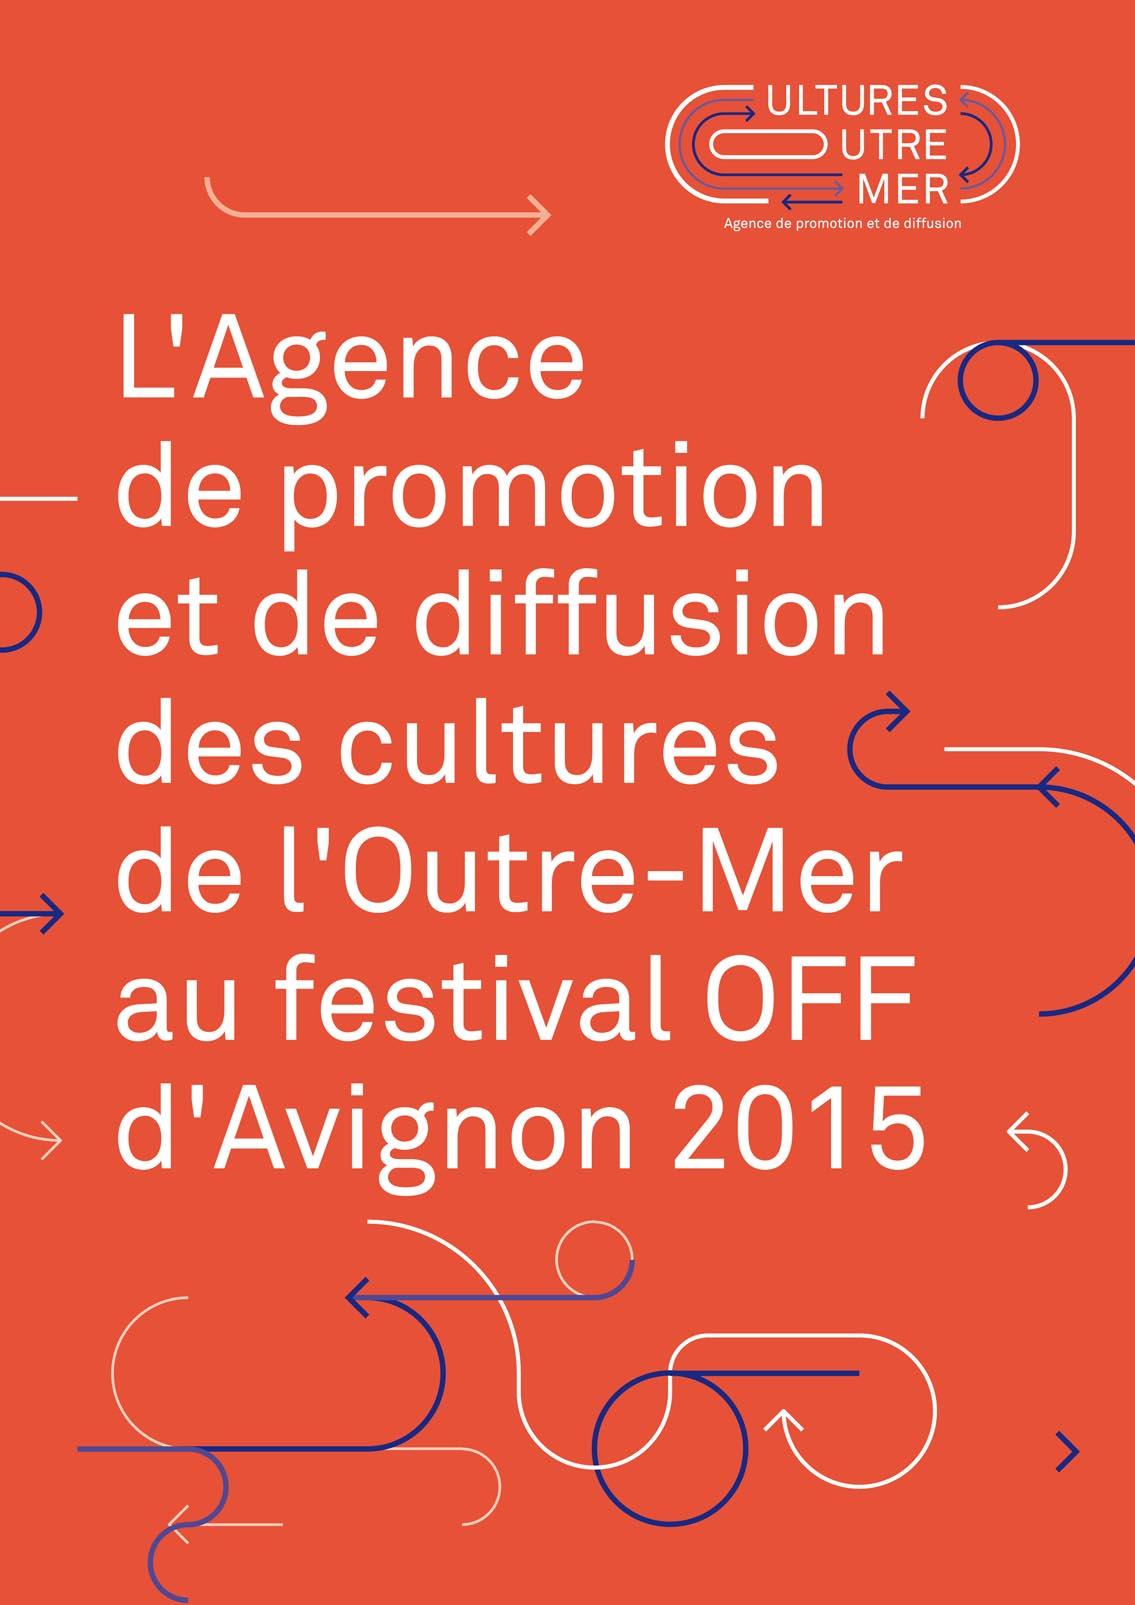 OM dépliant Avignon 2015 A4-quadri